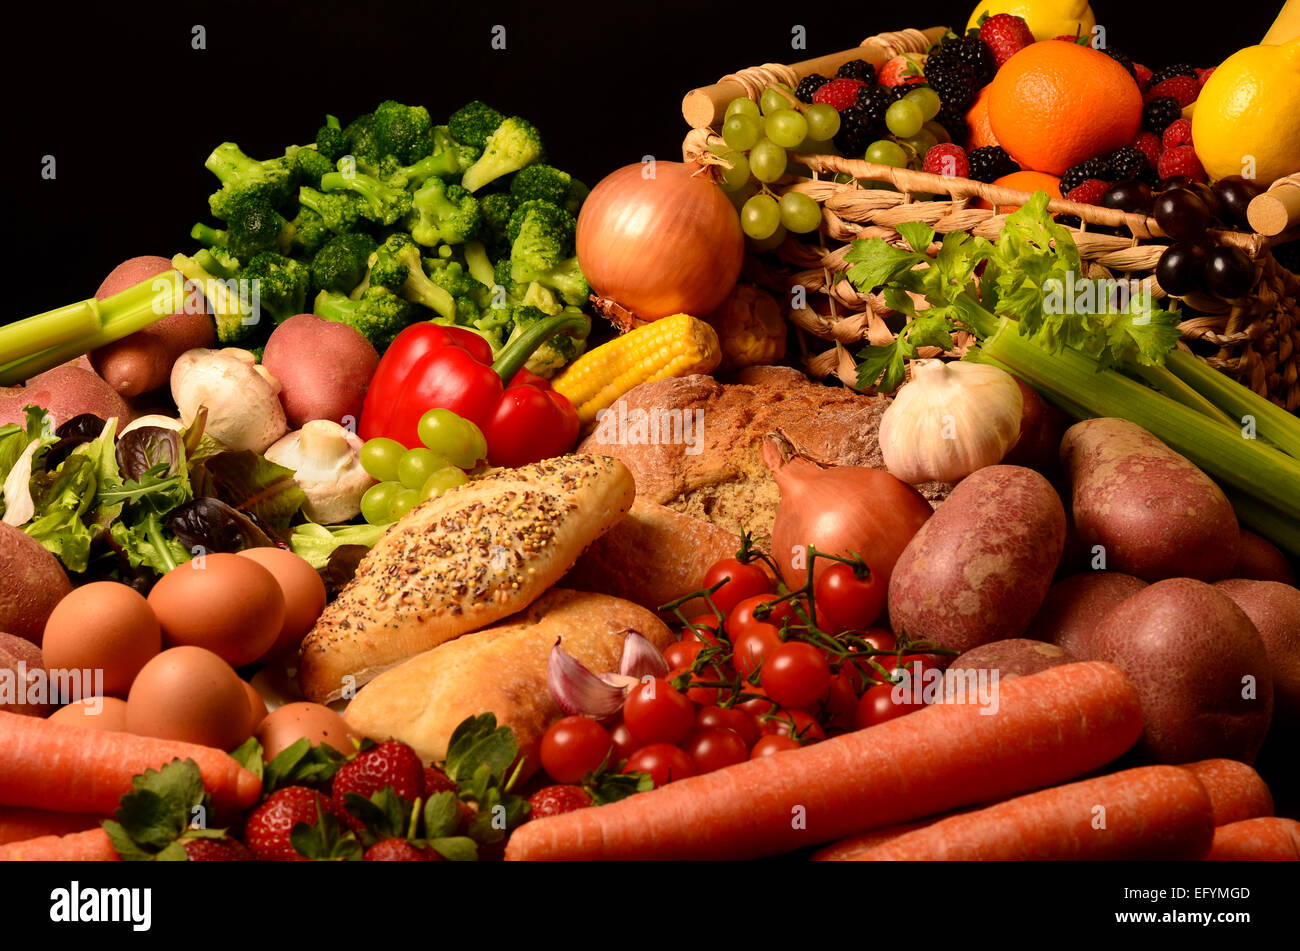 Healthy Food - Stock Image